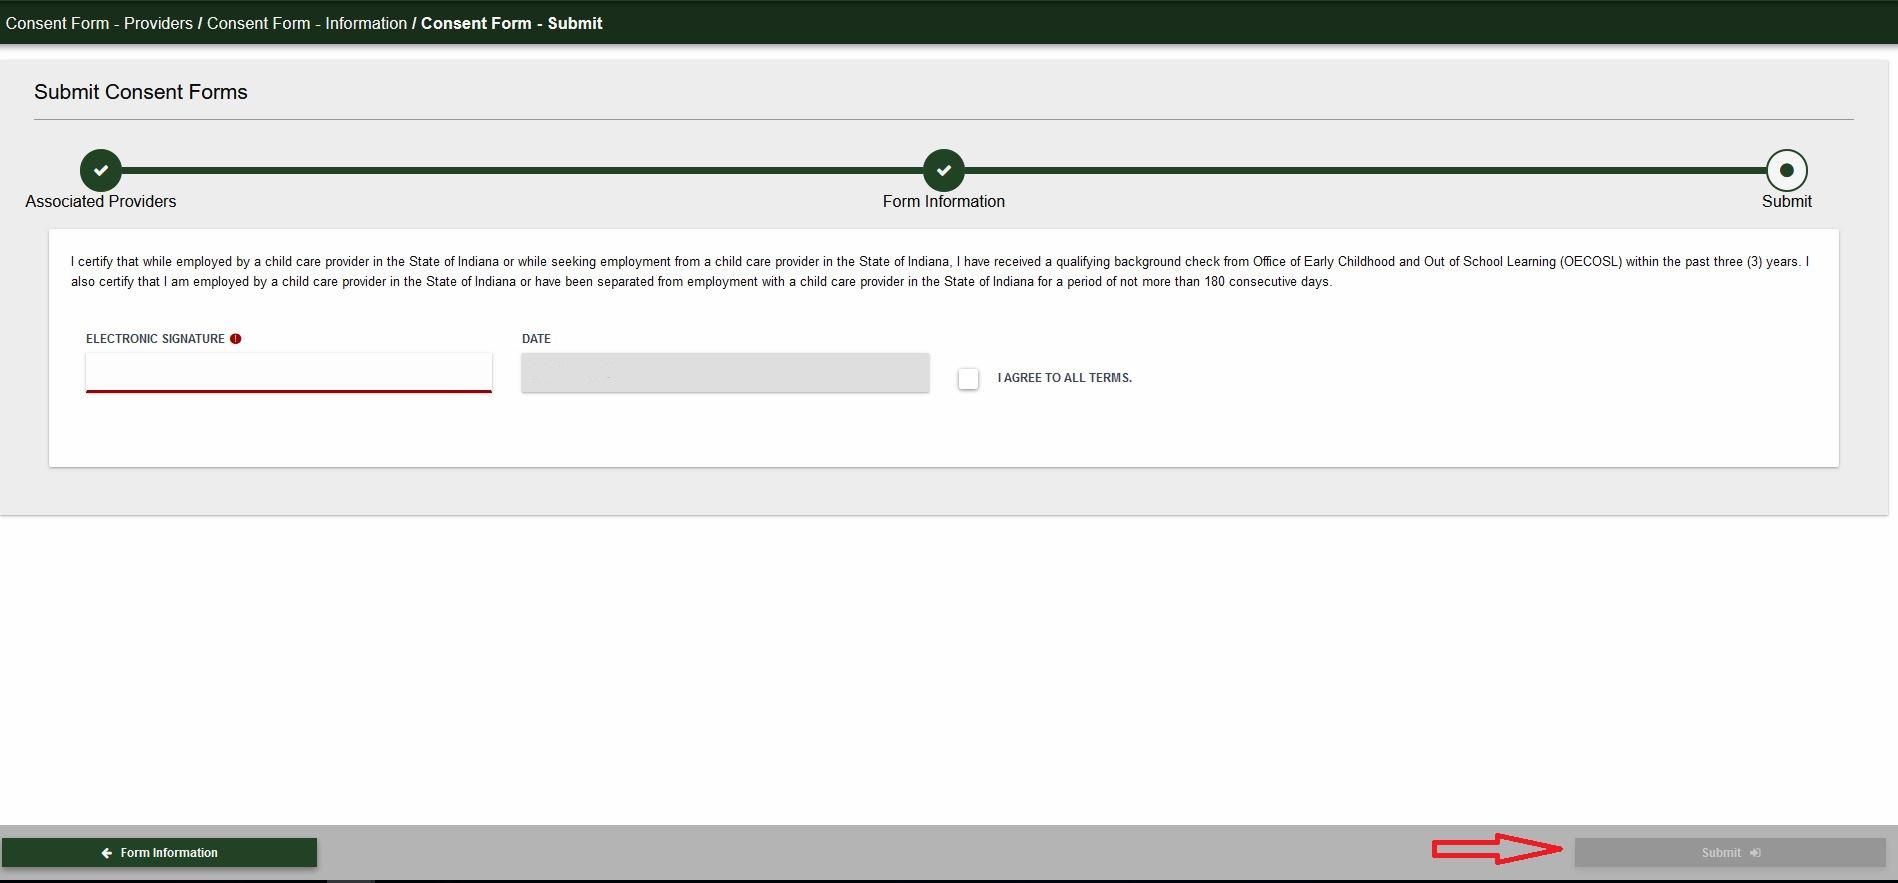 Submit screen screenshot